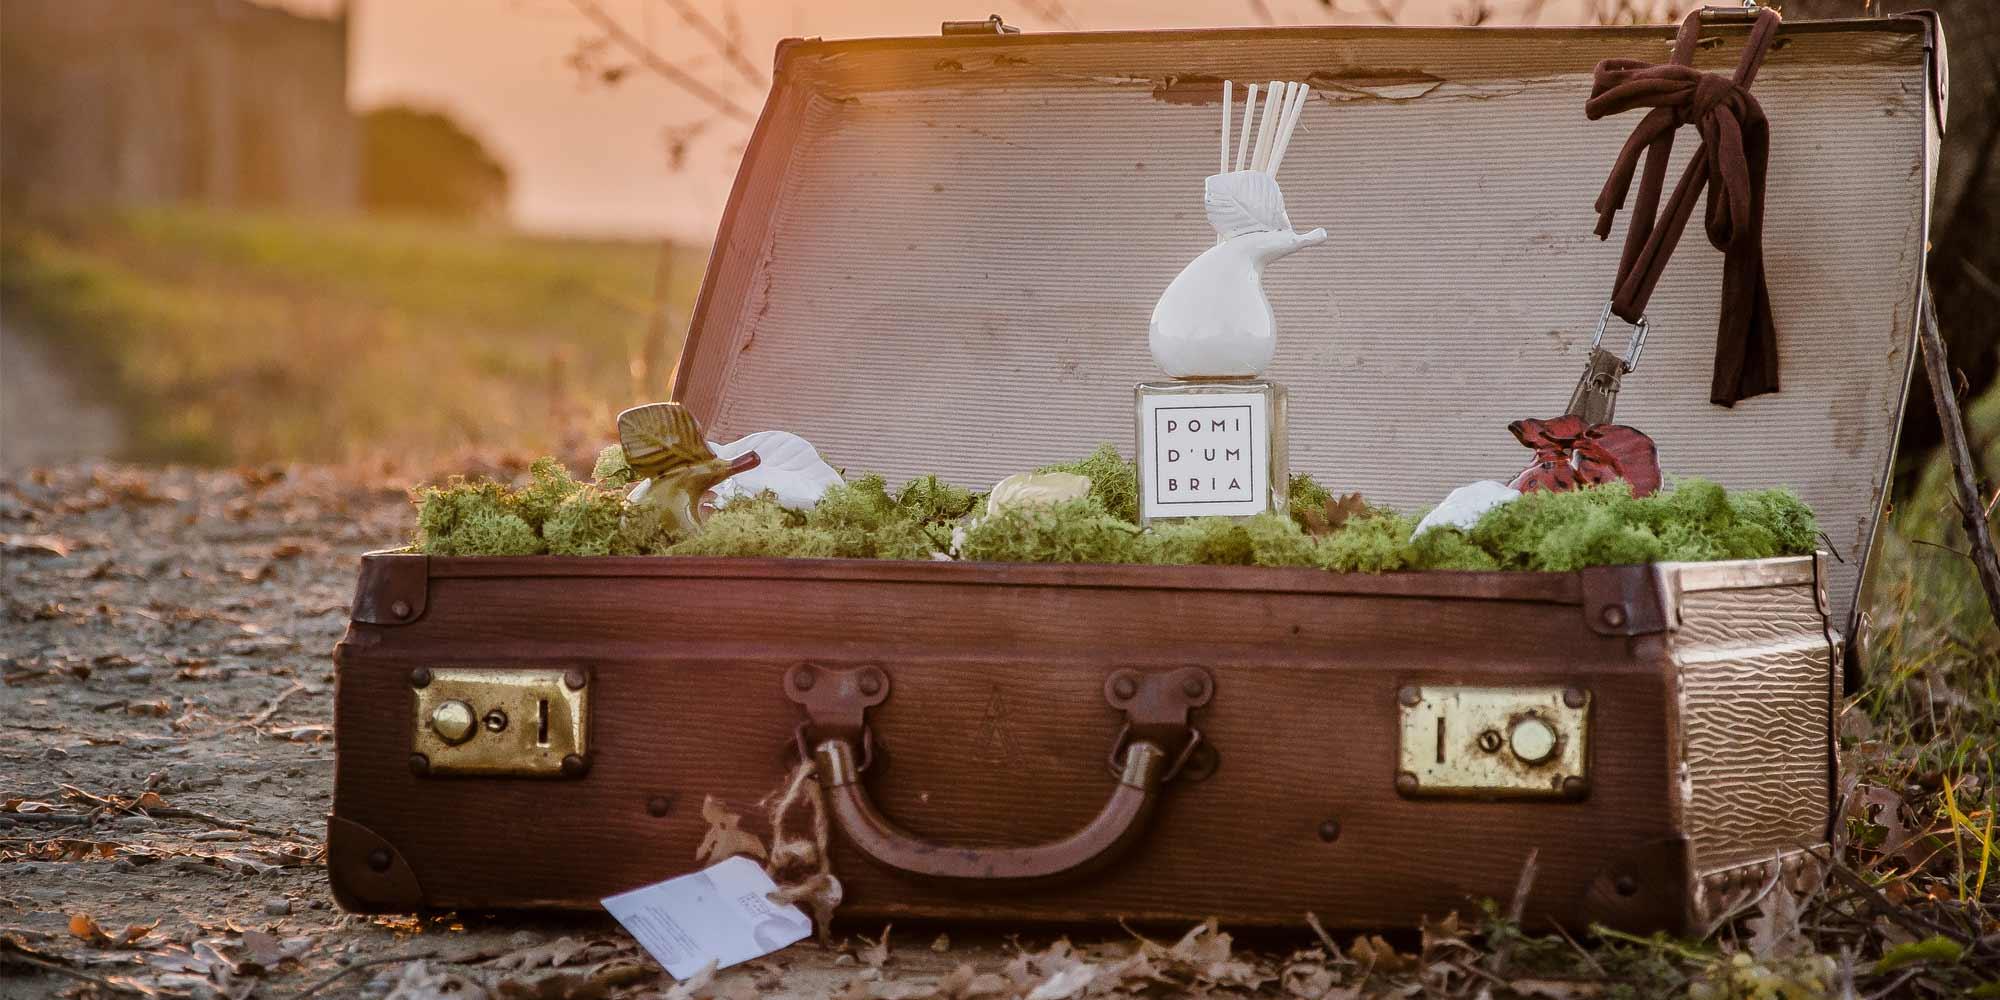 Pomi d'Umbria - Fragranza d'Ambiente